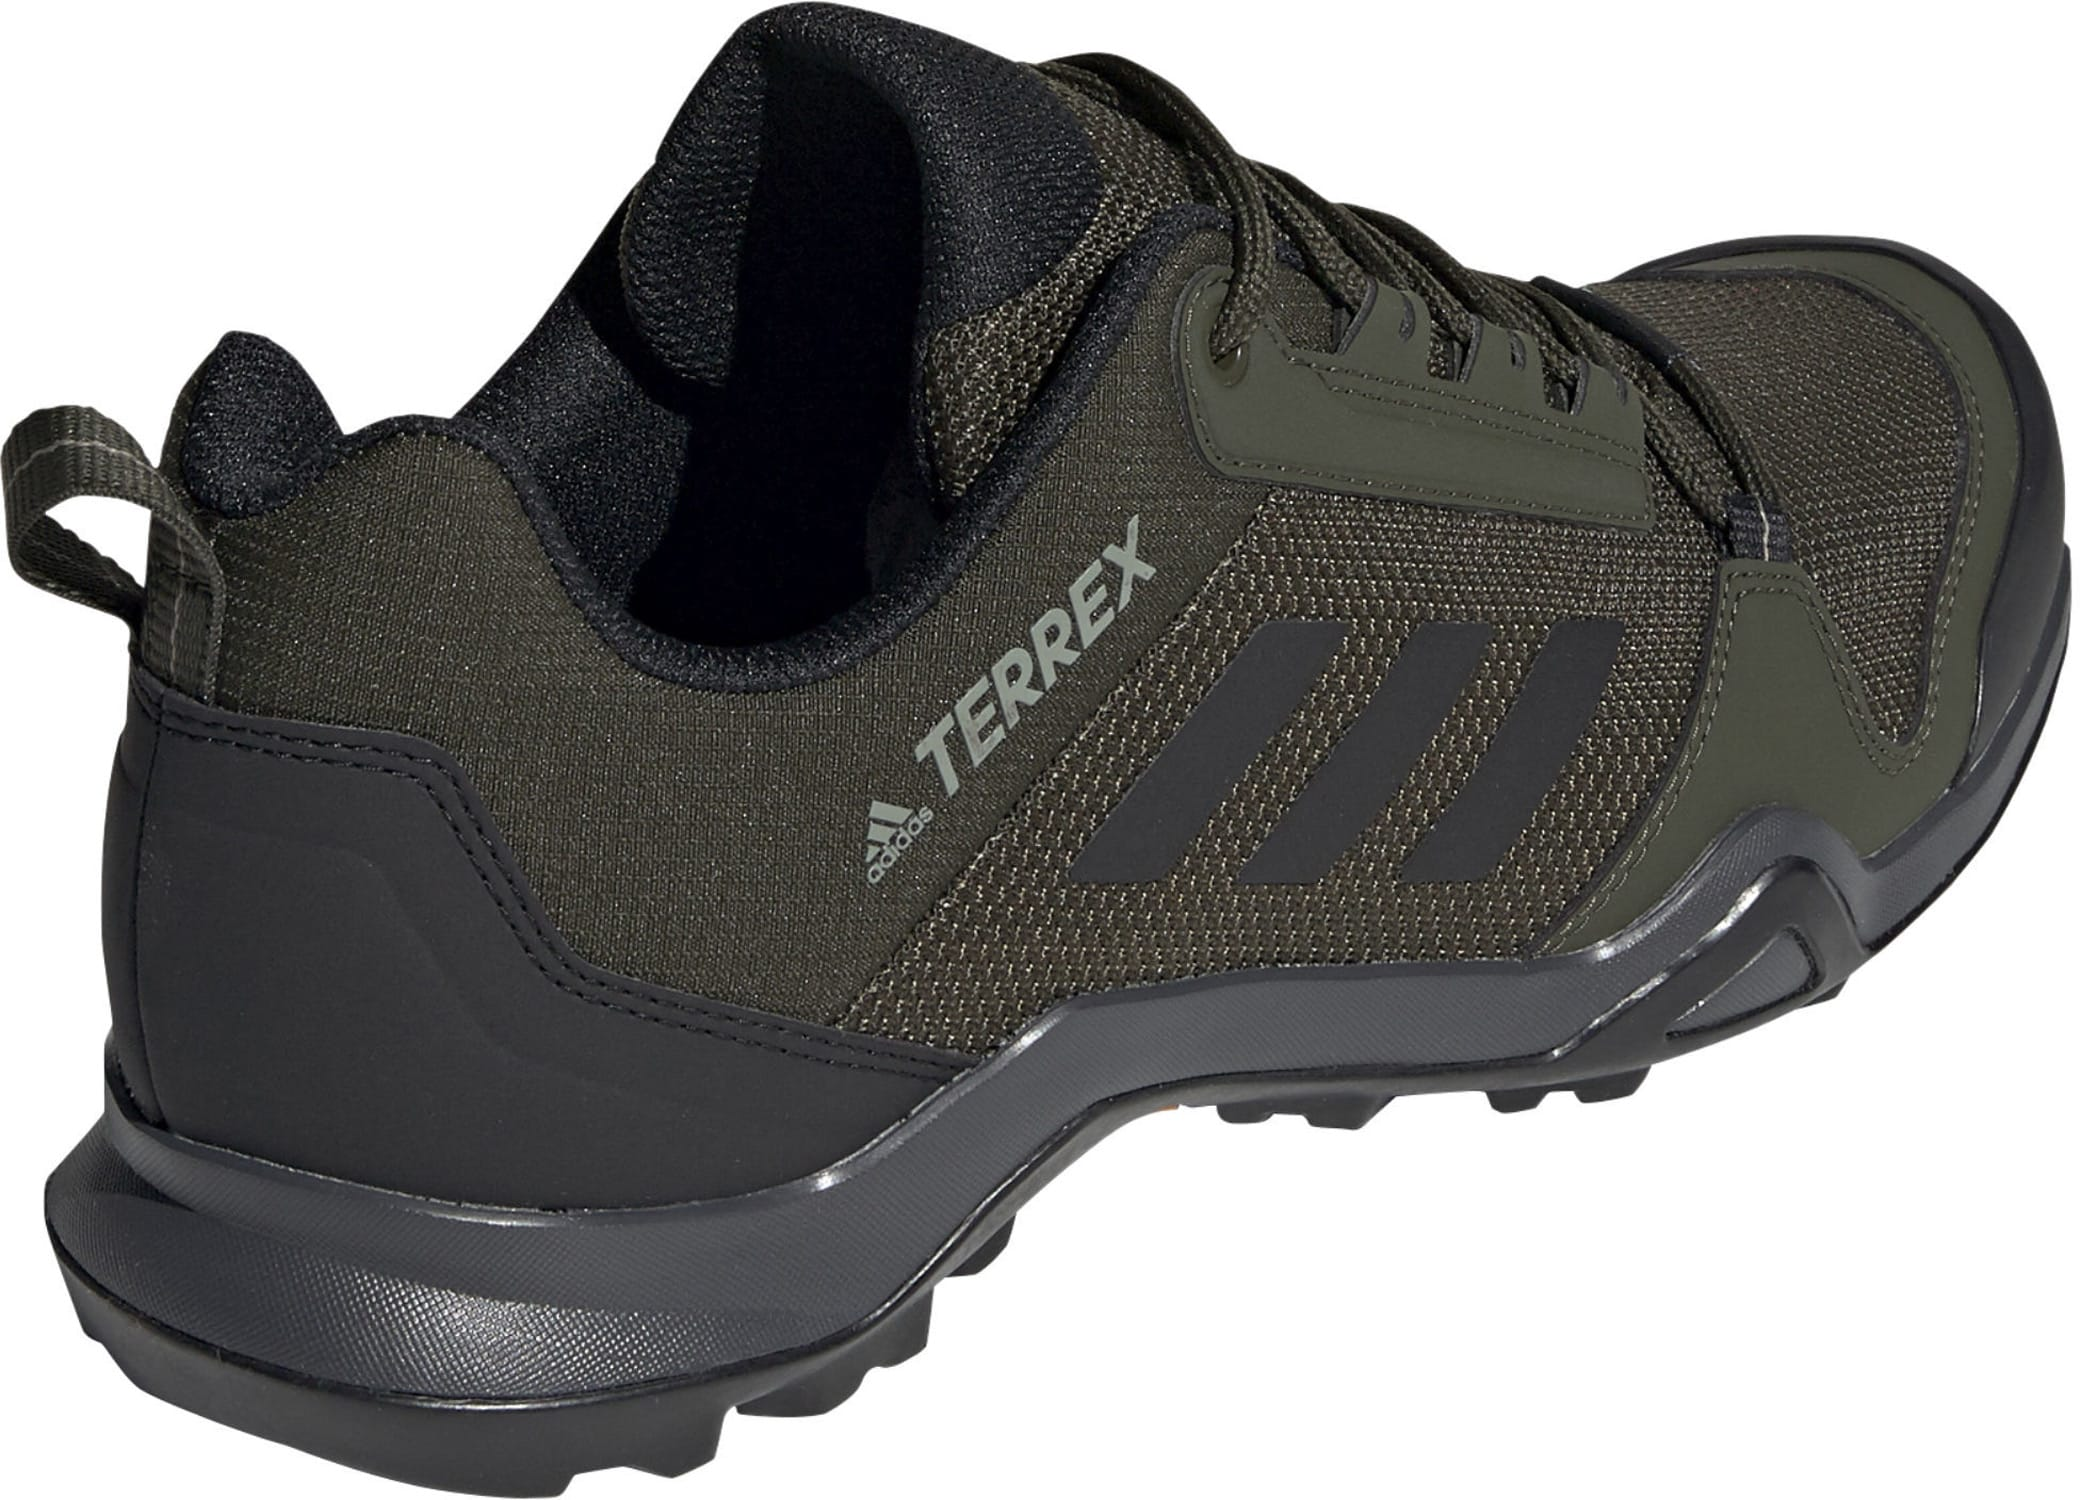 Adidas Terrex AX3 Hiking Shoes Mens   eBay